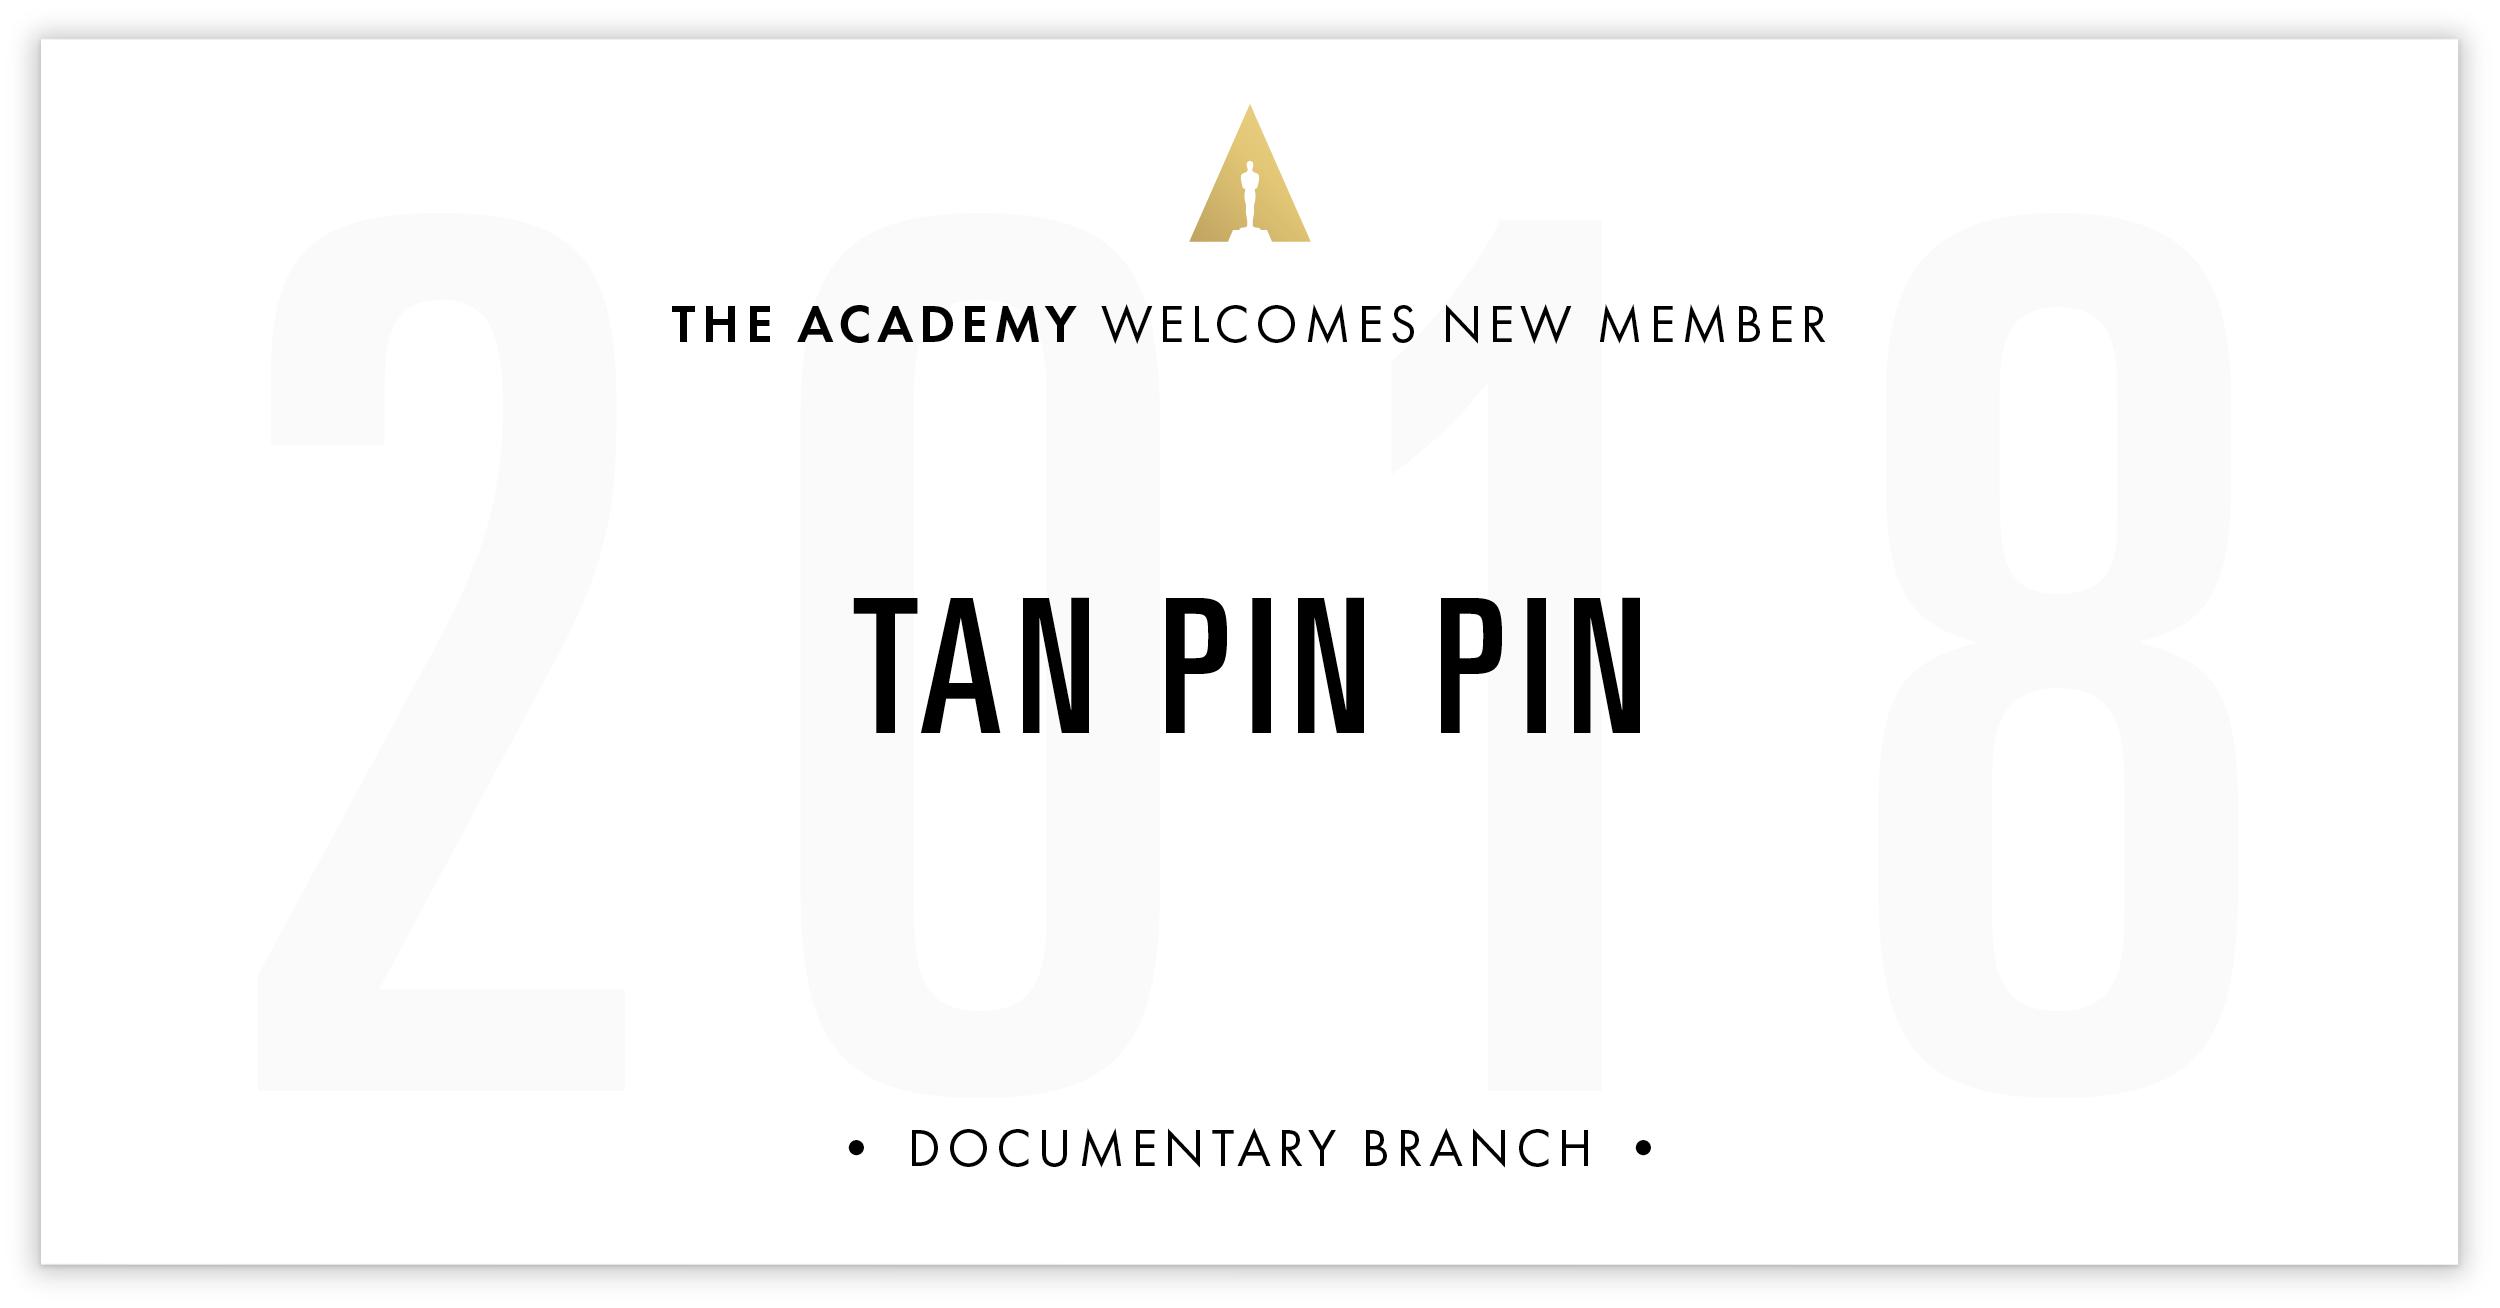 Tan Pin Pin is invited!